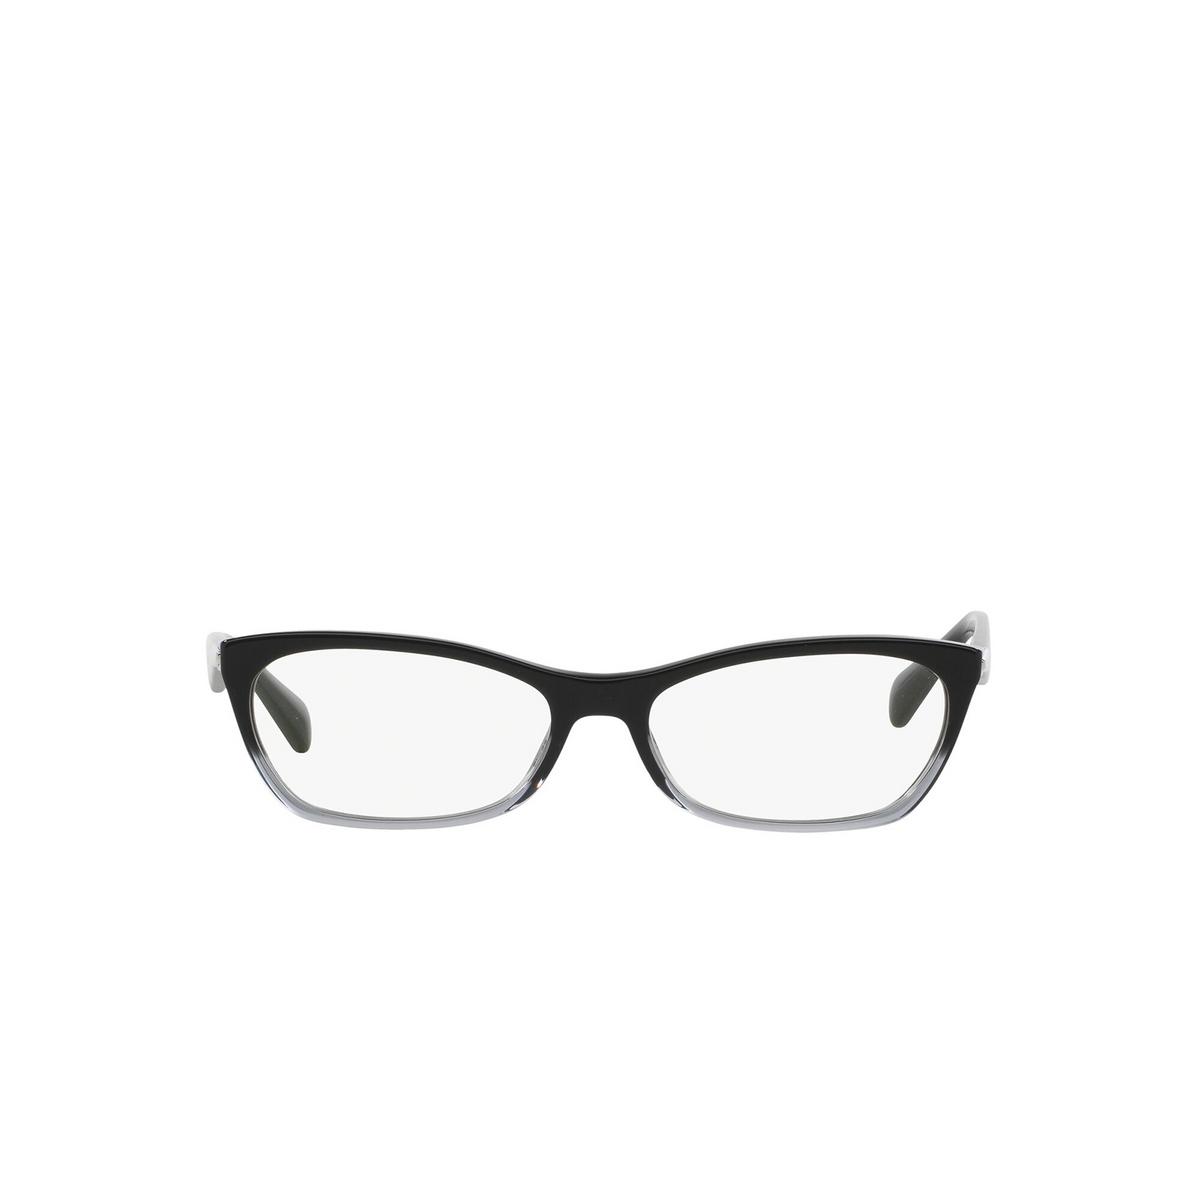 Prada® Cat-eye Eyeglasses: Catwalk PR 15PV color Black Gradient Transparent ZYY1O1 - front view.